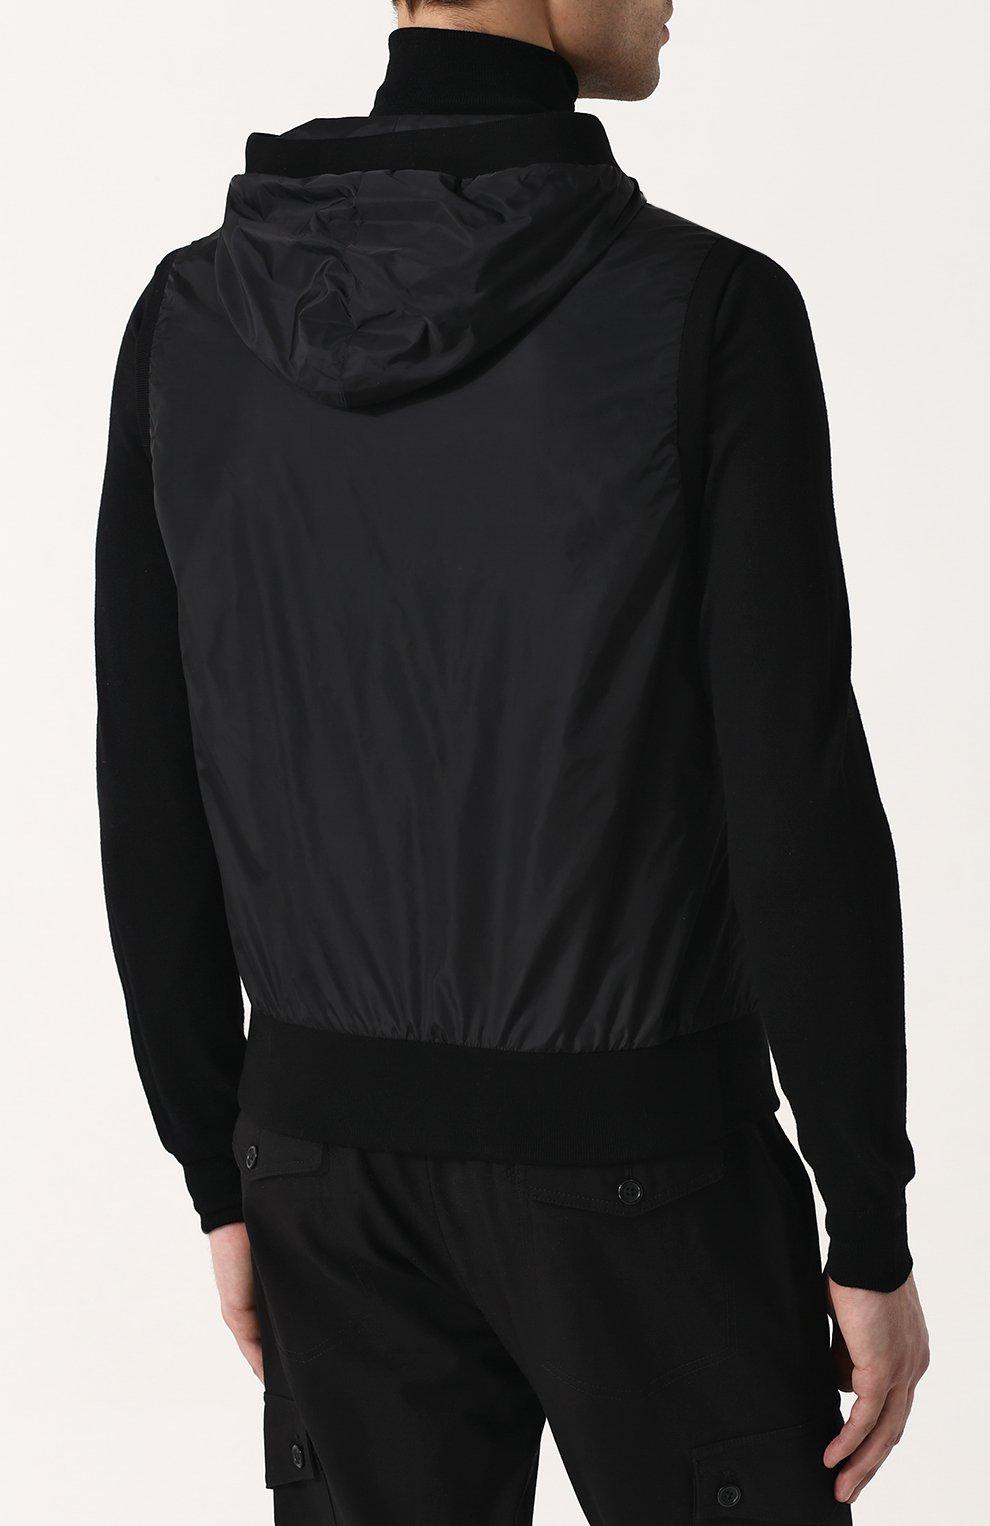 Мужской жилет на молнии с капюшоном DOLCE & GABBANA черного цвета, арт. G9KU0T/FUMQG   Фото 4